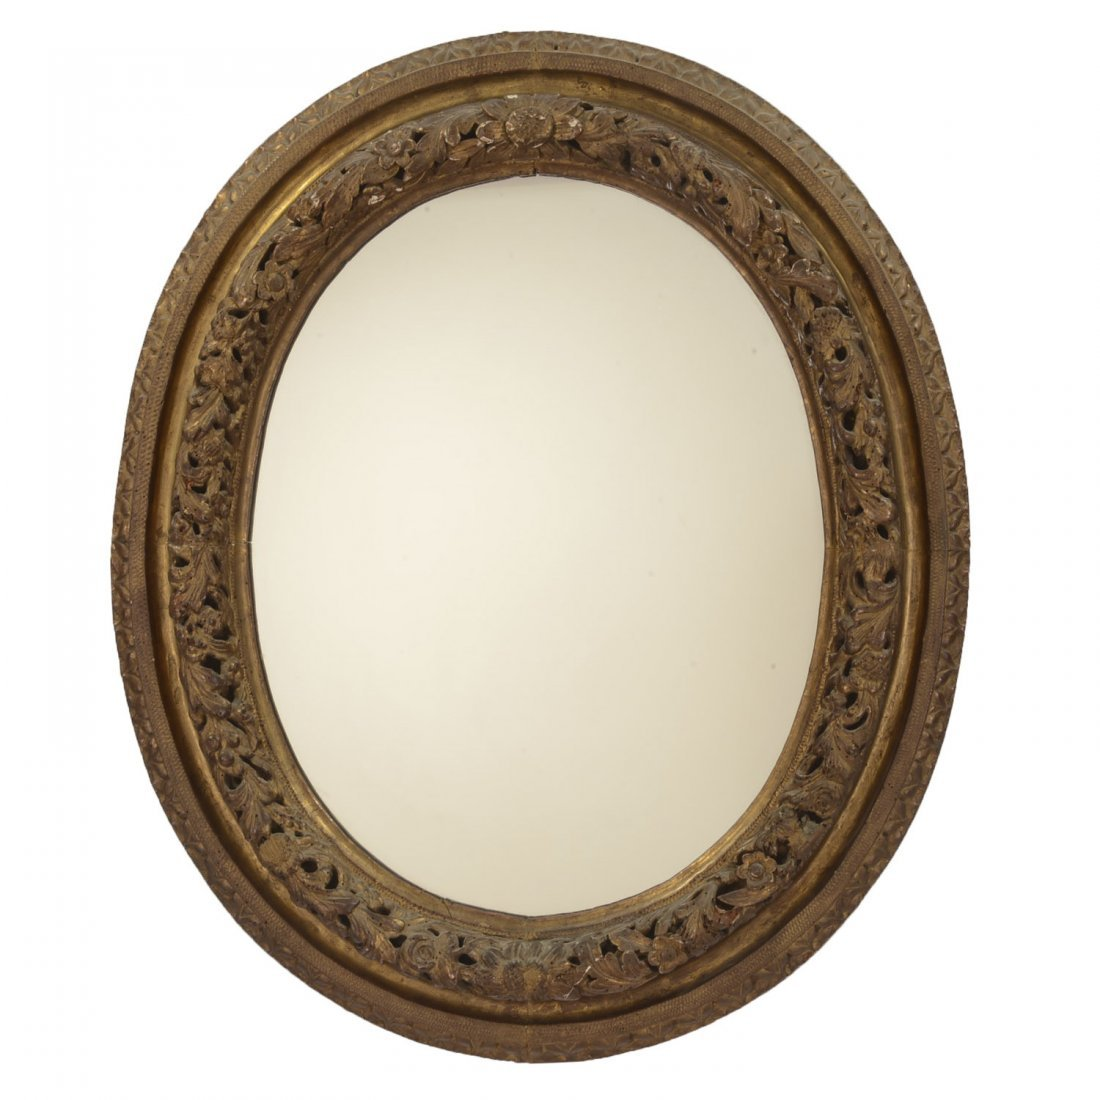 Continental Rococo giltwood oval wall mirror